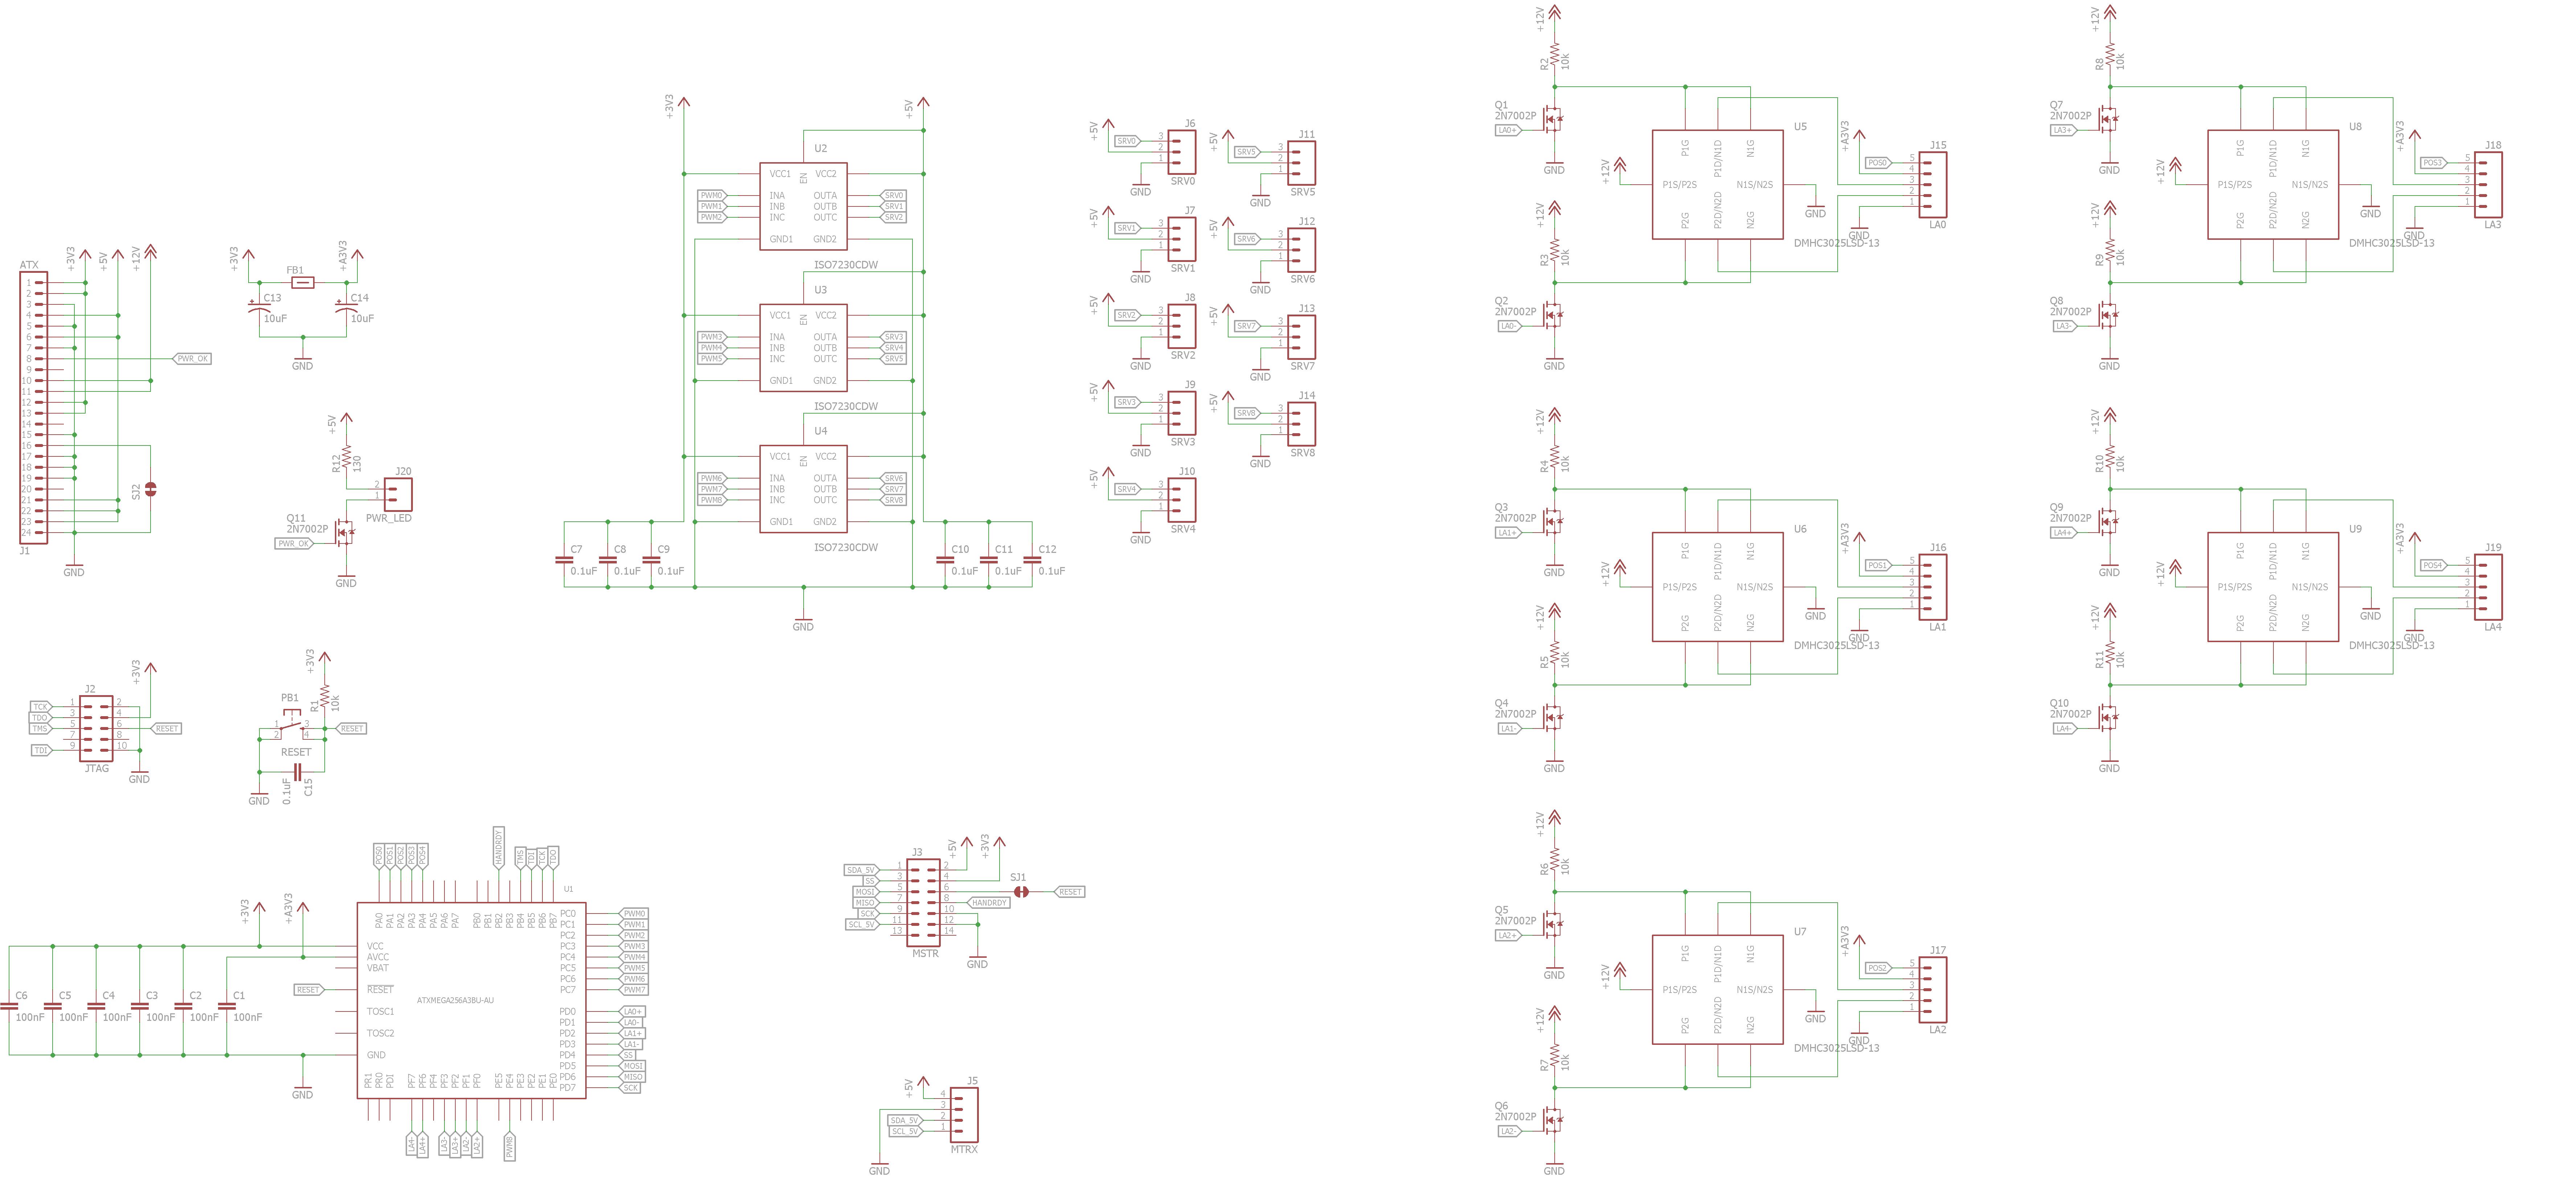 Ece477 Course Documents Circuit Diagram Quiz Board Figure 63 Hand Pcb Schematic